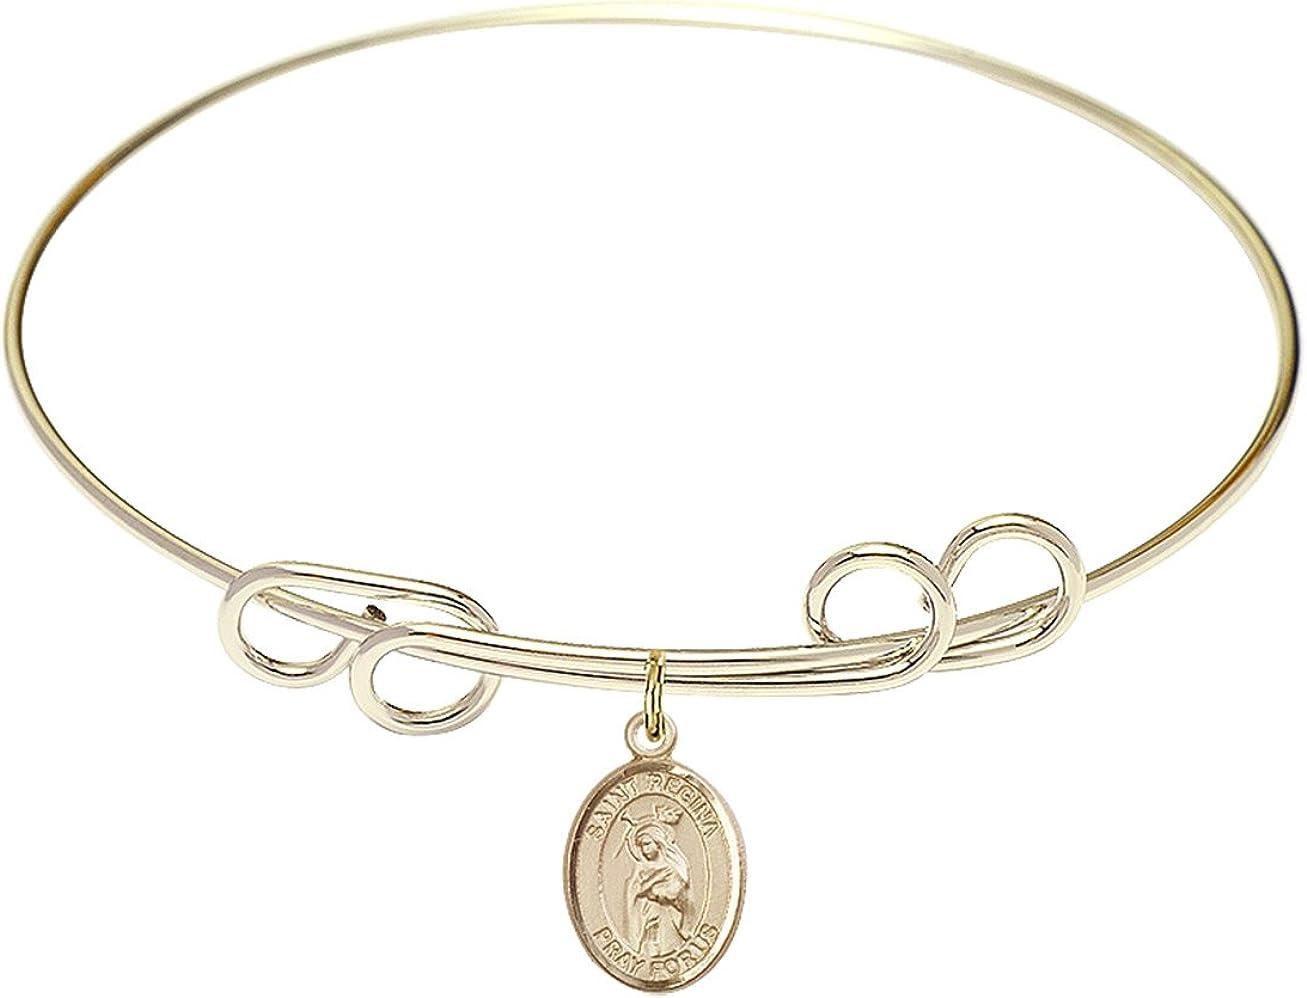 DiamondJewelryNY Double Loop Bangle Bracelet with a St. Regina Charm.